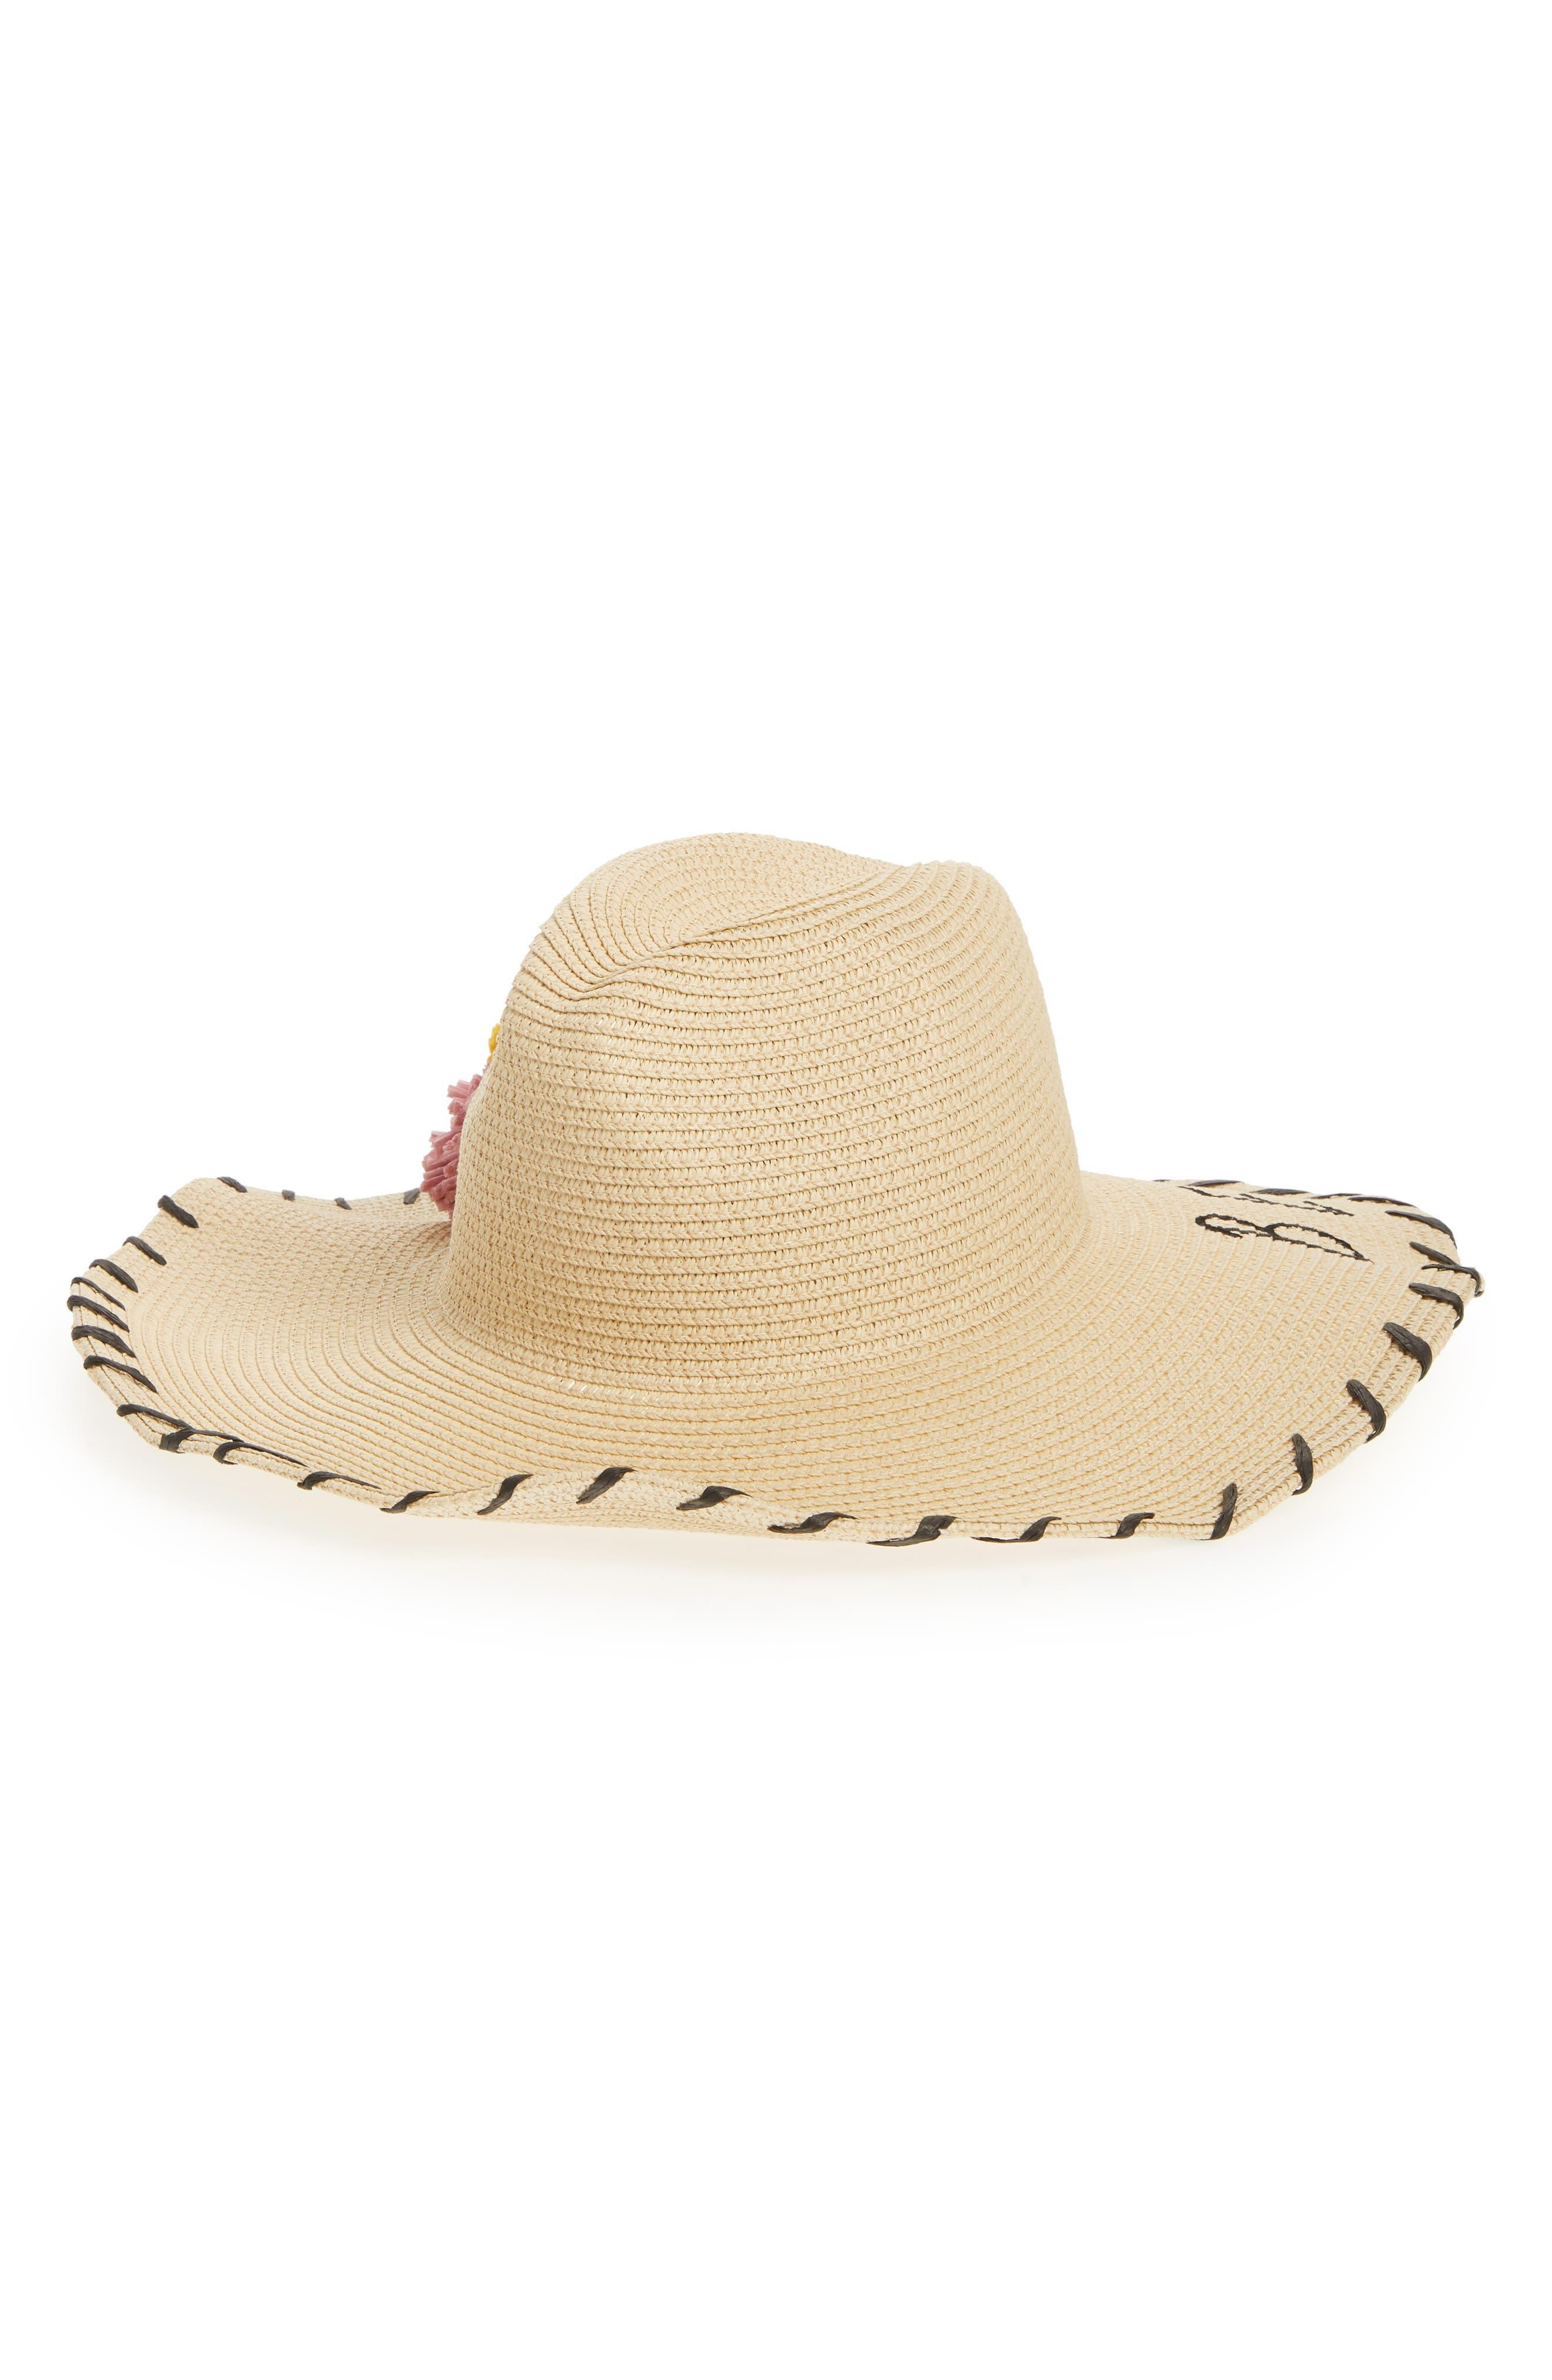 Verbiage Pom Straw Panama Hat,                             Alternate thumbnail 2, color,                             Natural